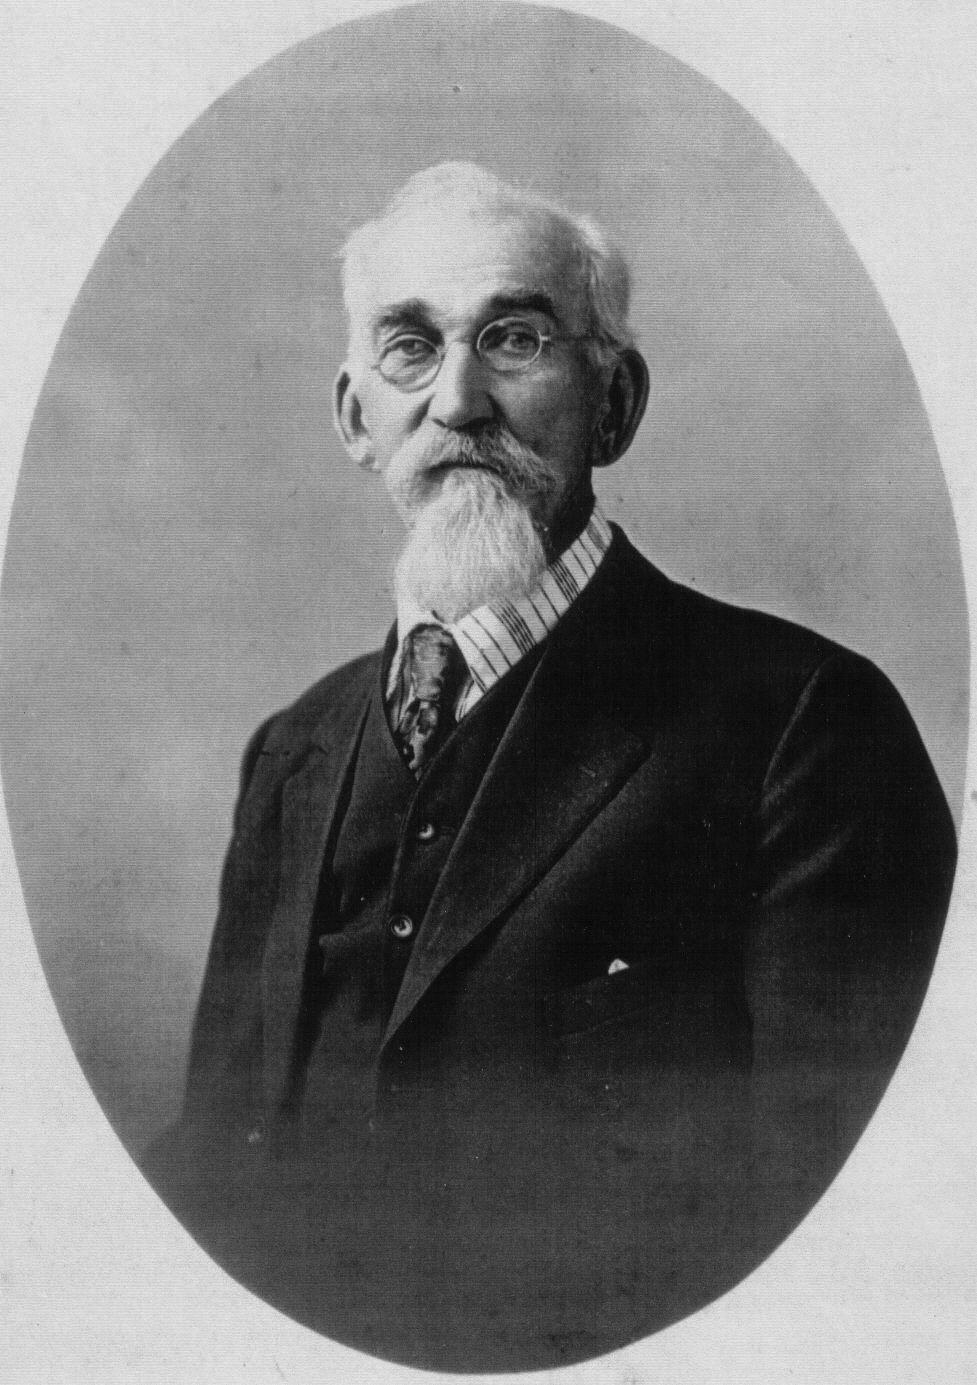 Wesley Hinchman 1845-1936 Cabell County, WV